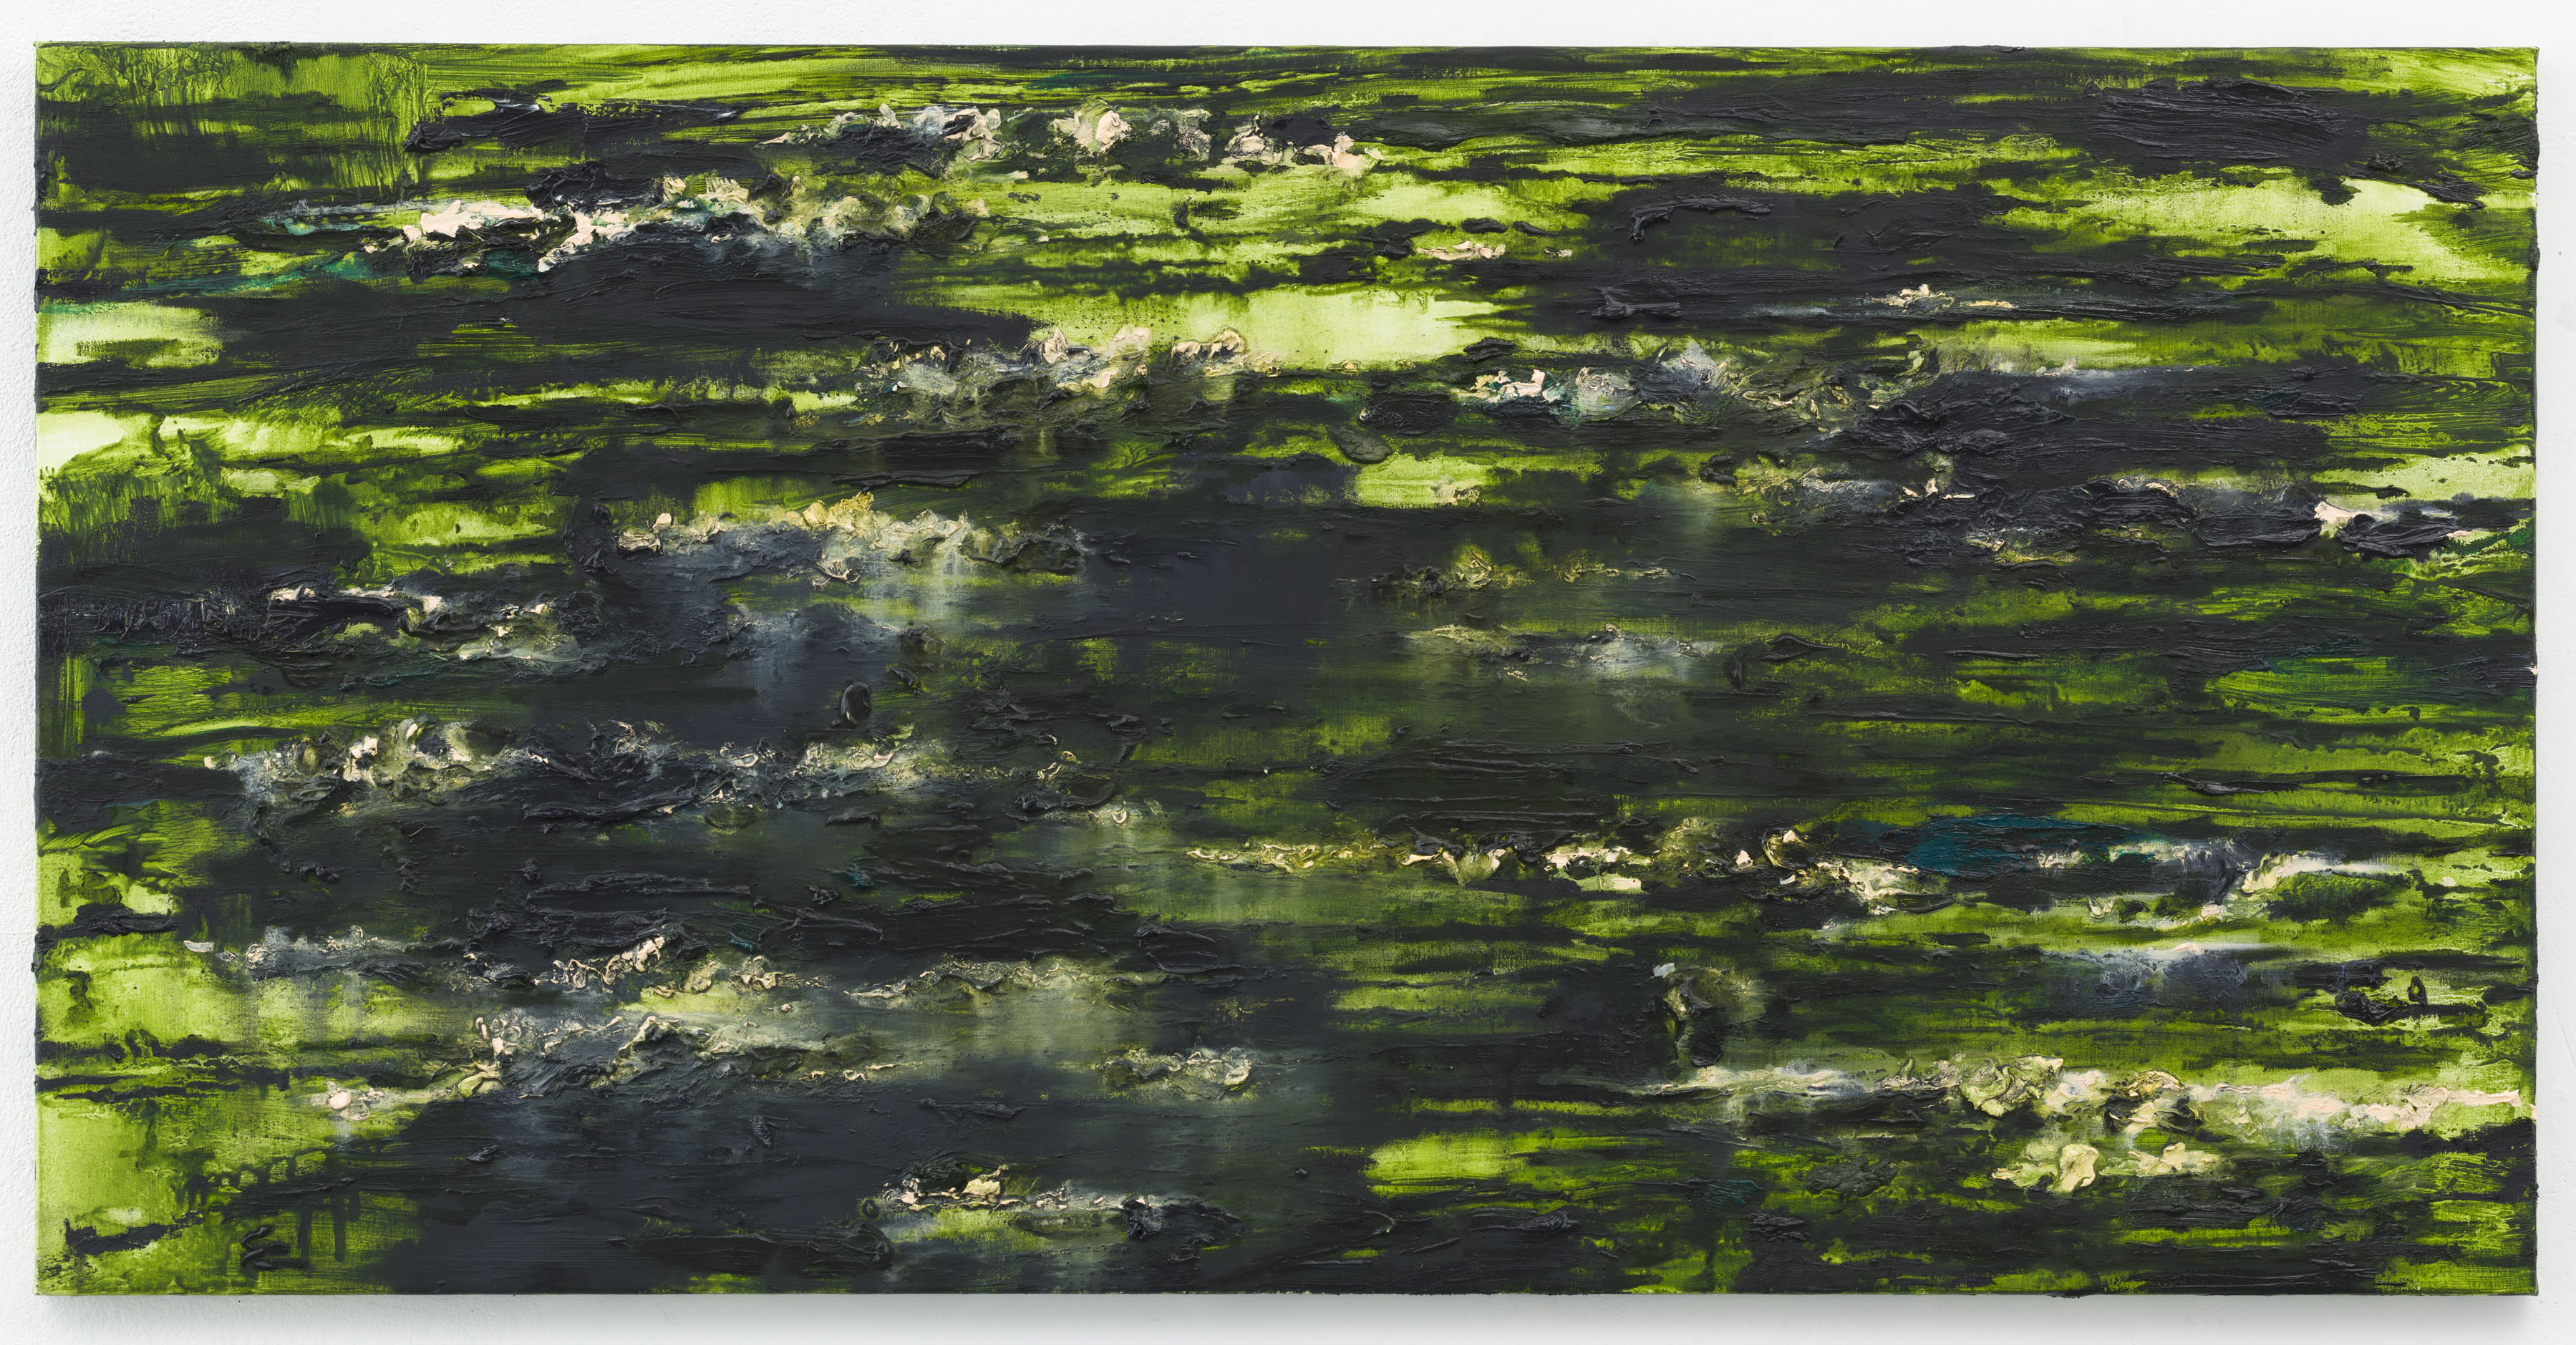 """Etang des Nympheas III"" 70 x 140 cm. oil on linen 2013"